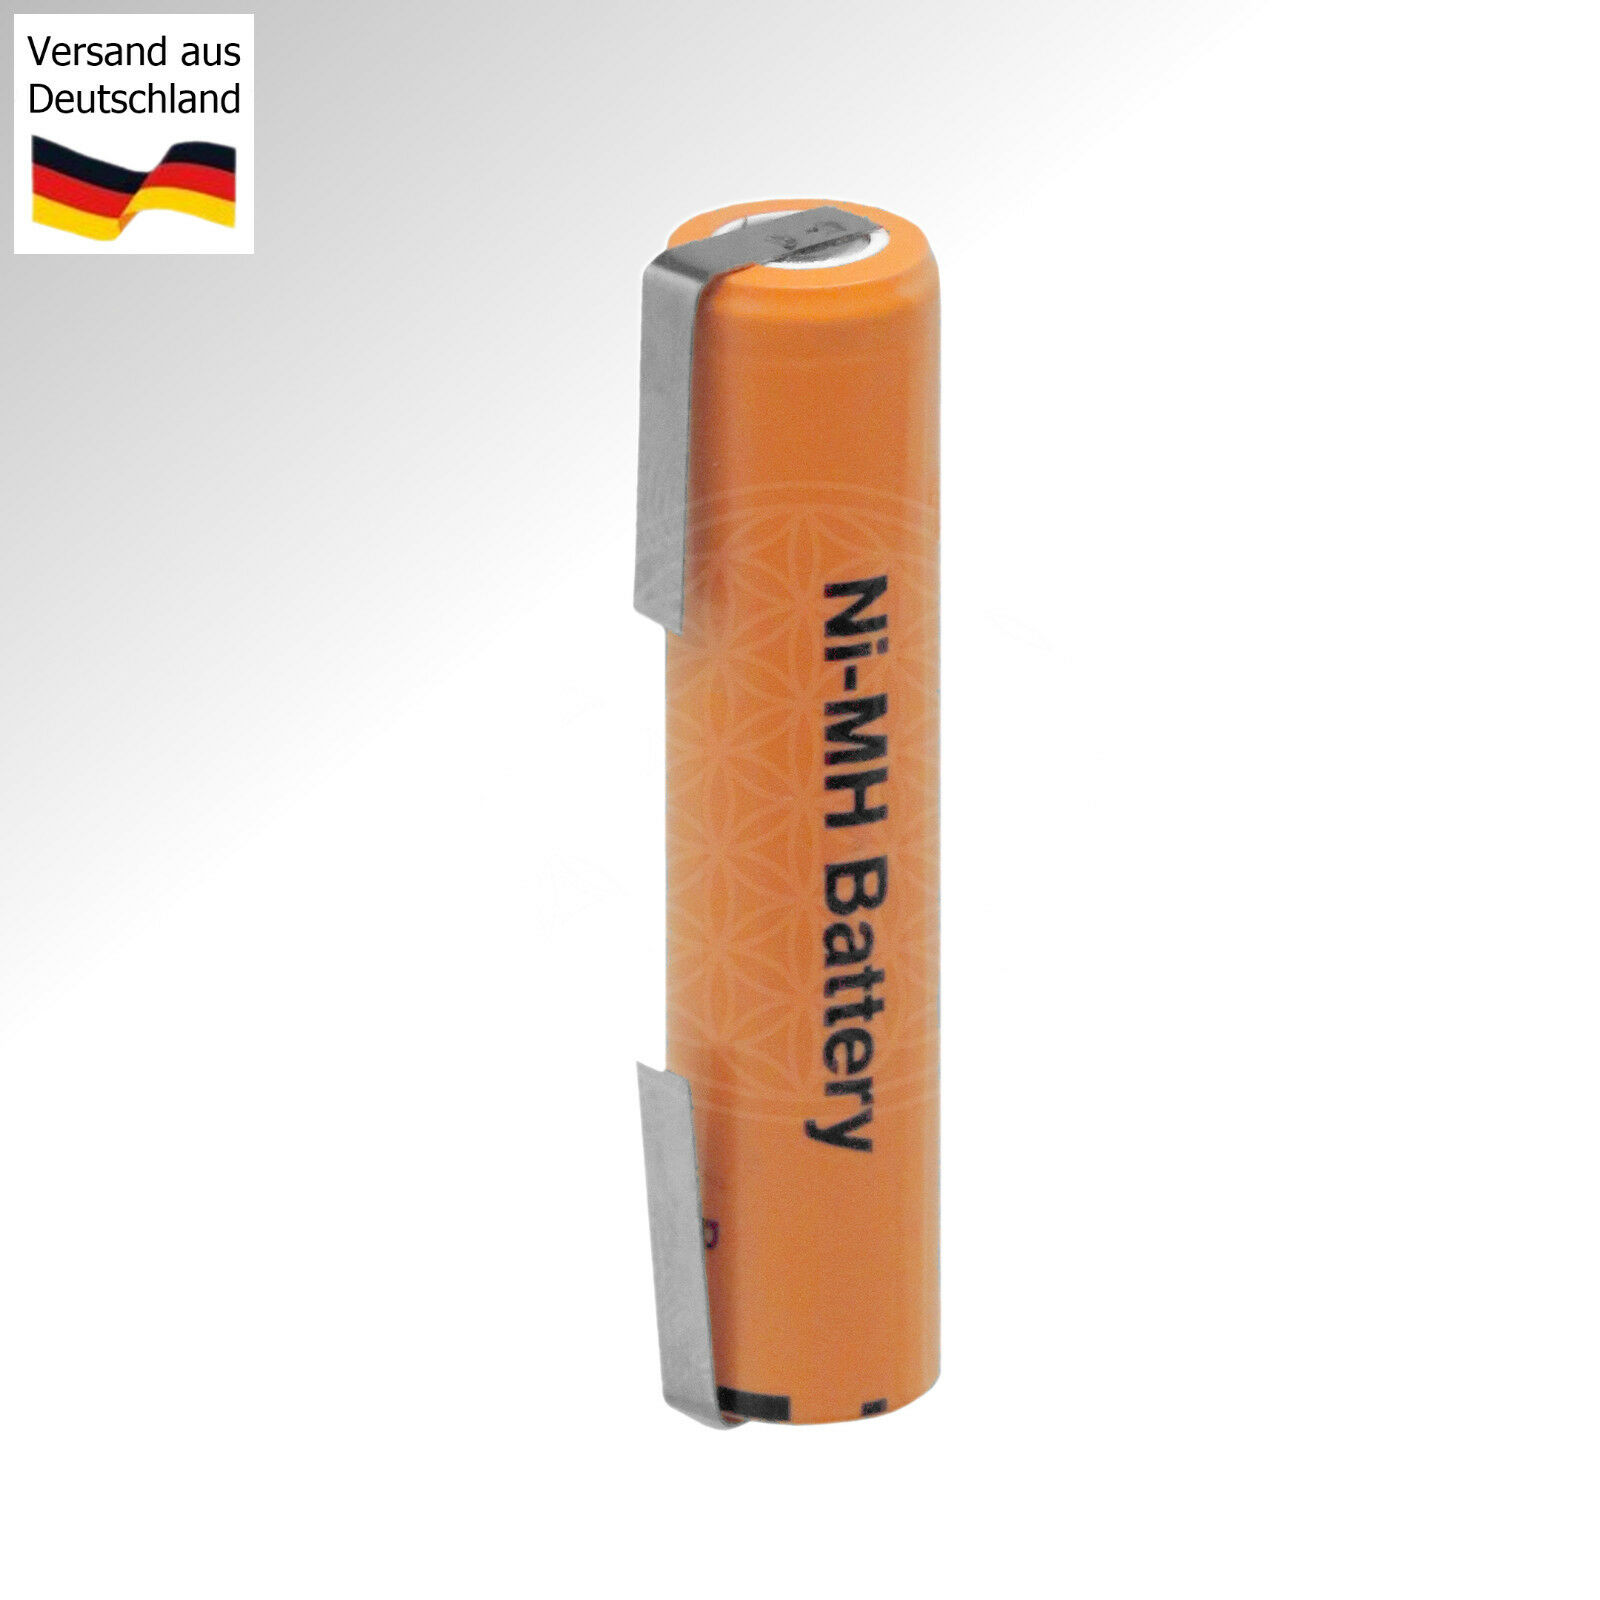 Ersatz Batterie für Haarschneidemaschine Wella Contura HS61 Haartrimmer Battery